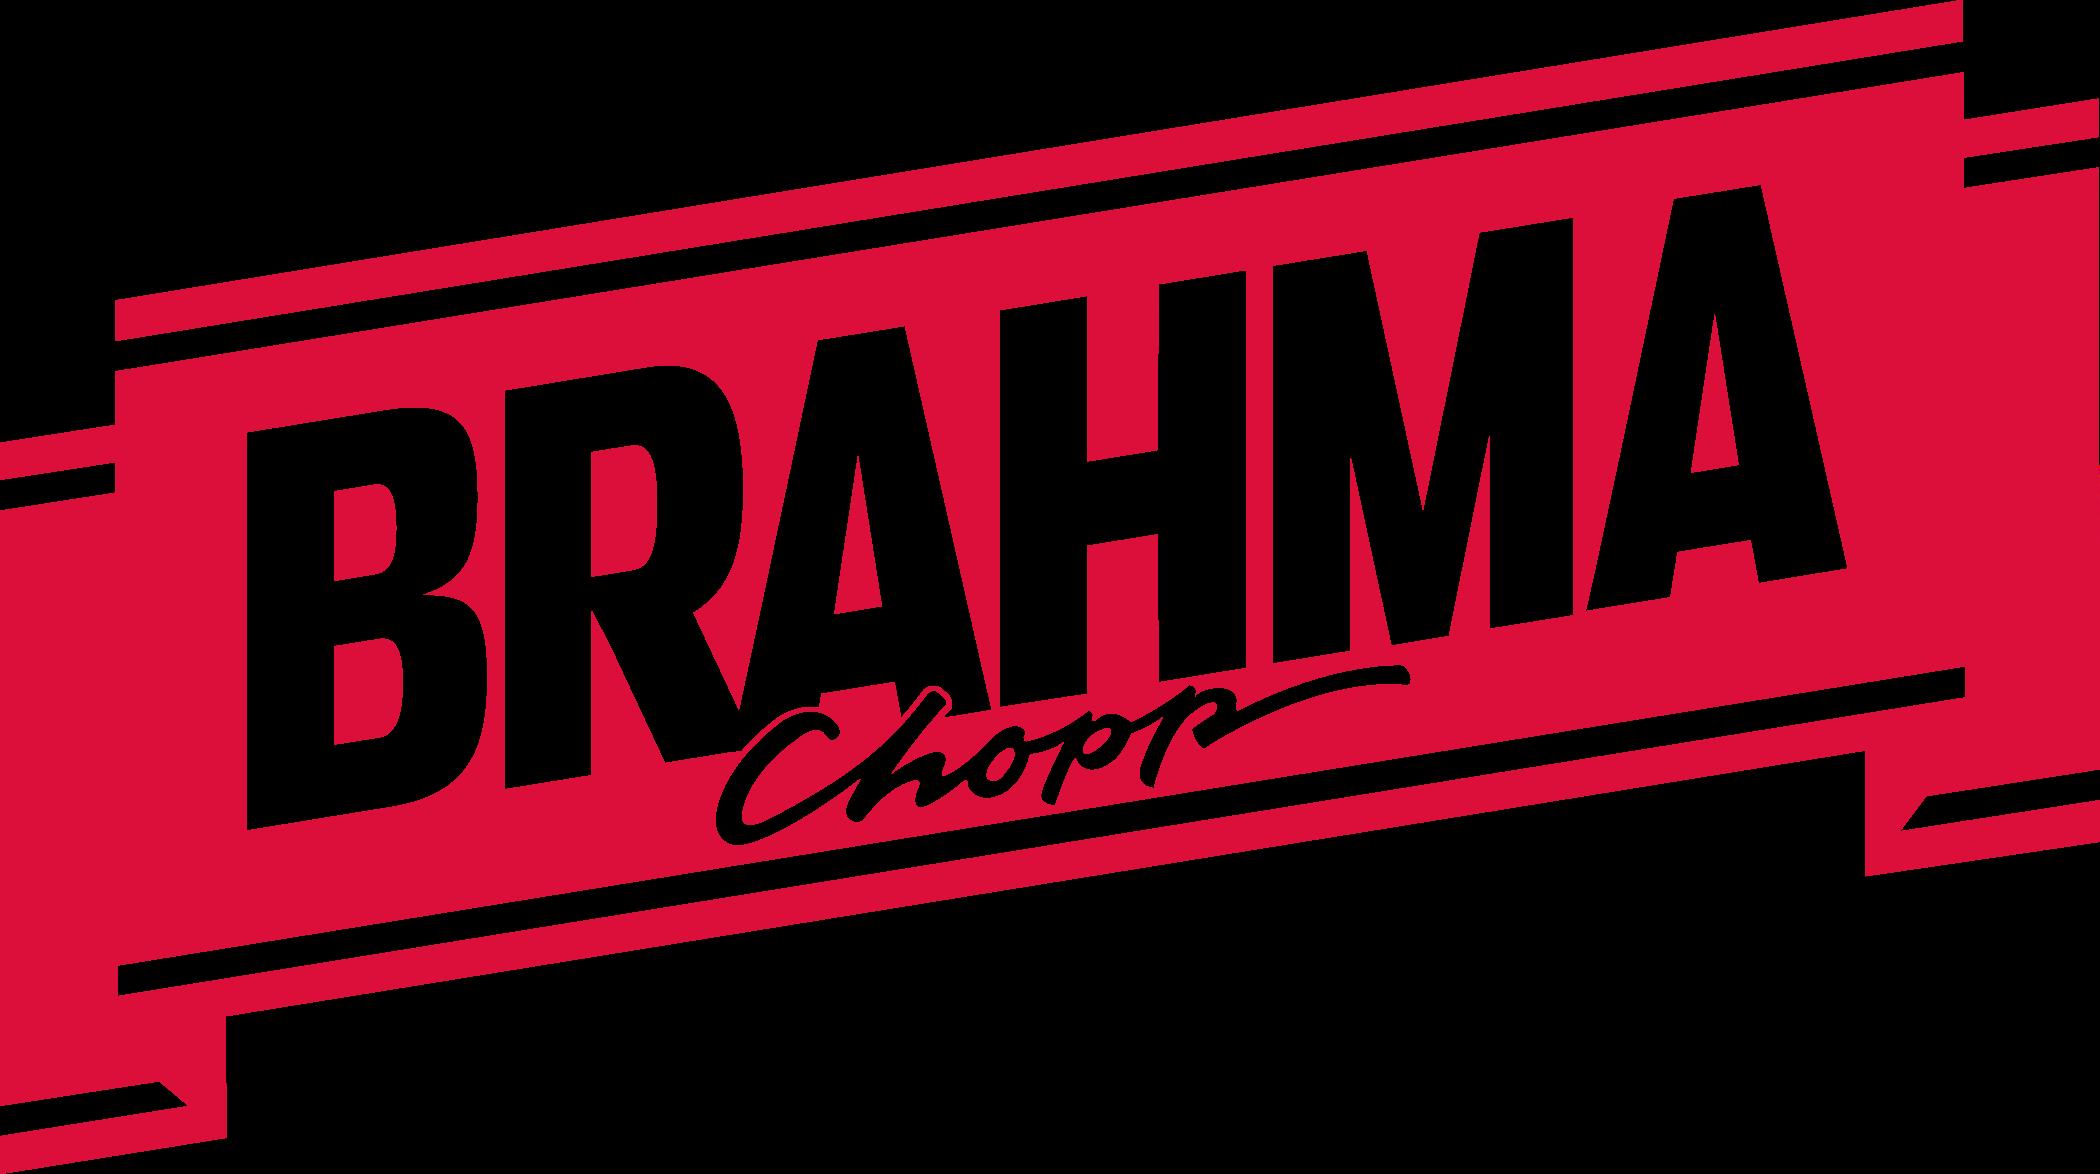 Chopp brahma logotipos 7271 Free Transparent PNG Logos